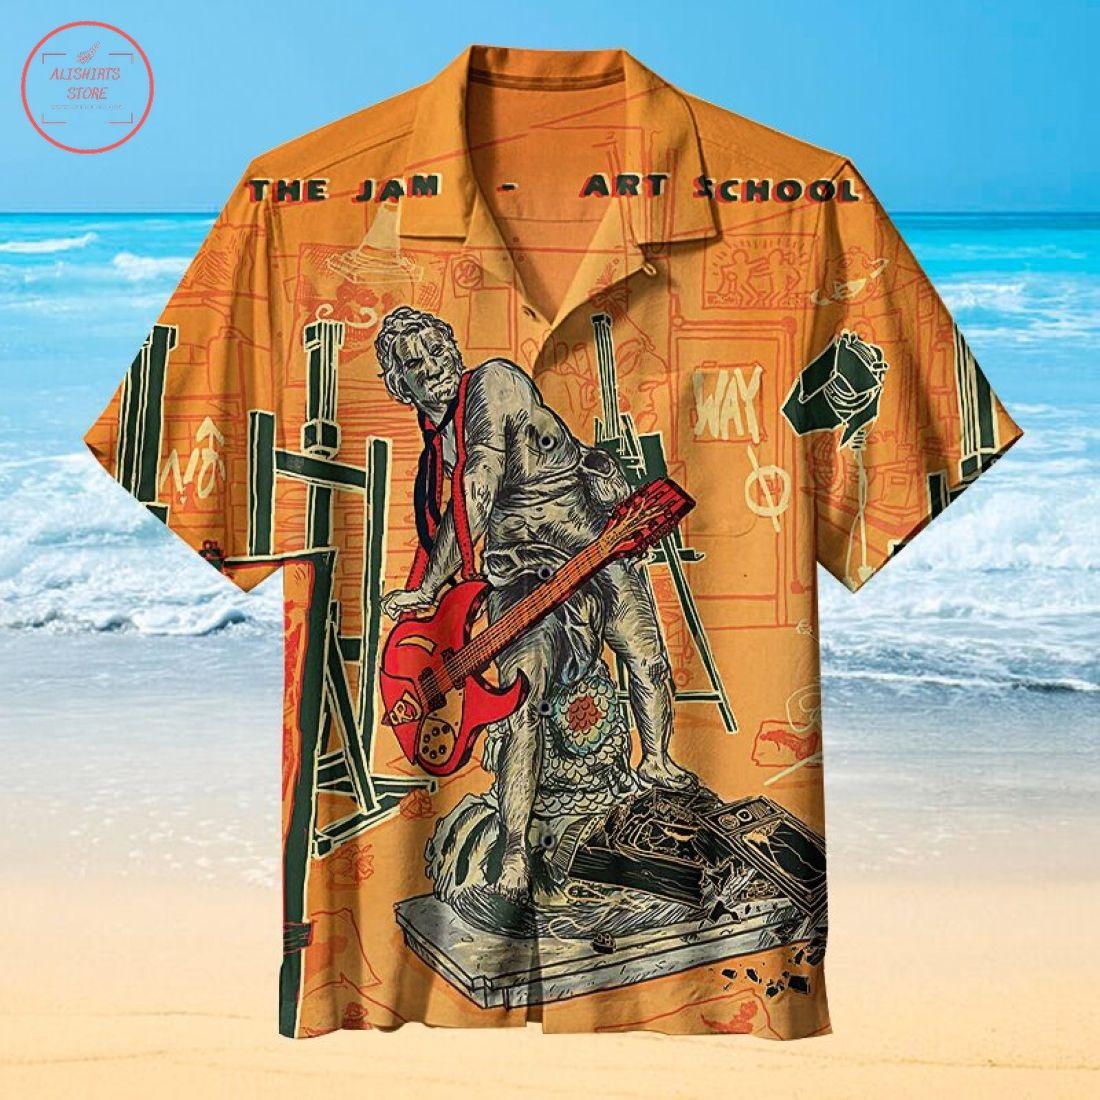 The Jam Art School Hawaiian Shirt